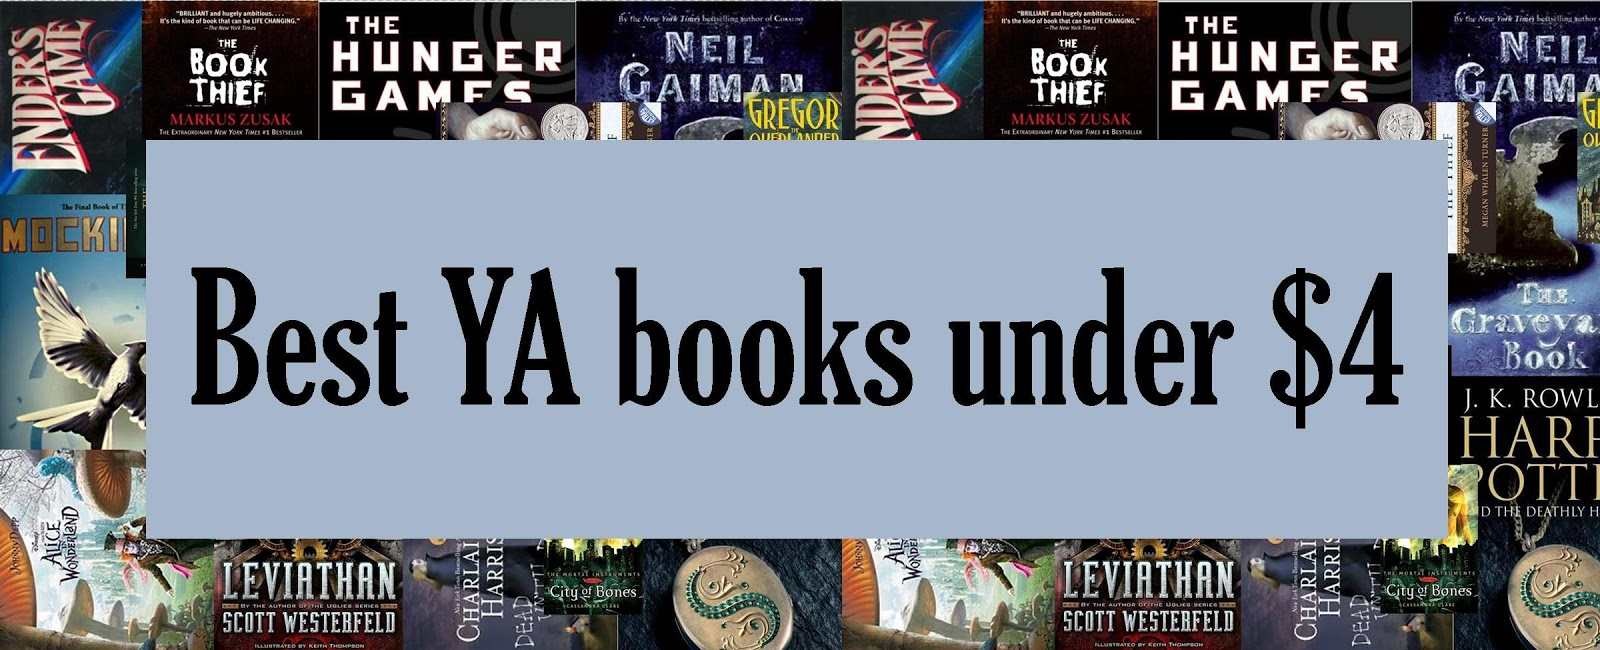 AprilWhiteBooks: Best YA Books Under $4